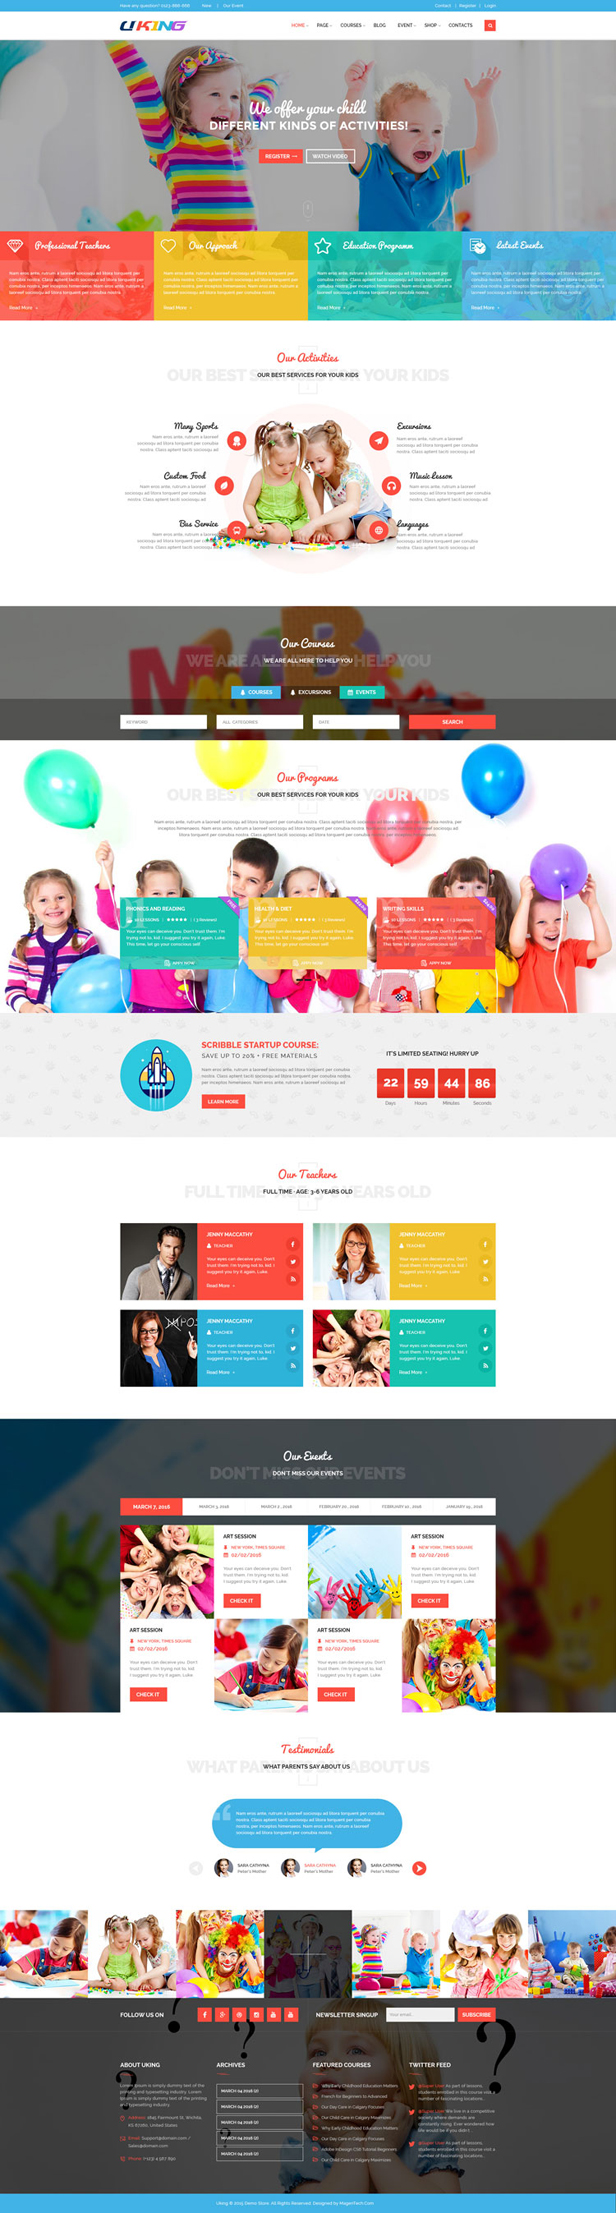 01_Homepage-K3IAu.jpg